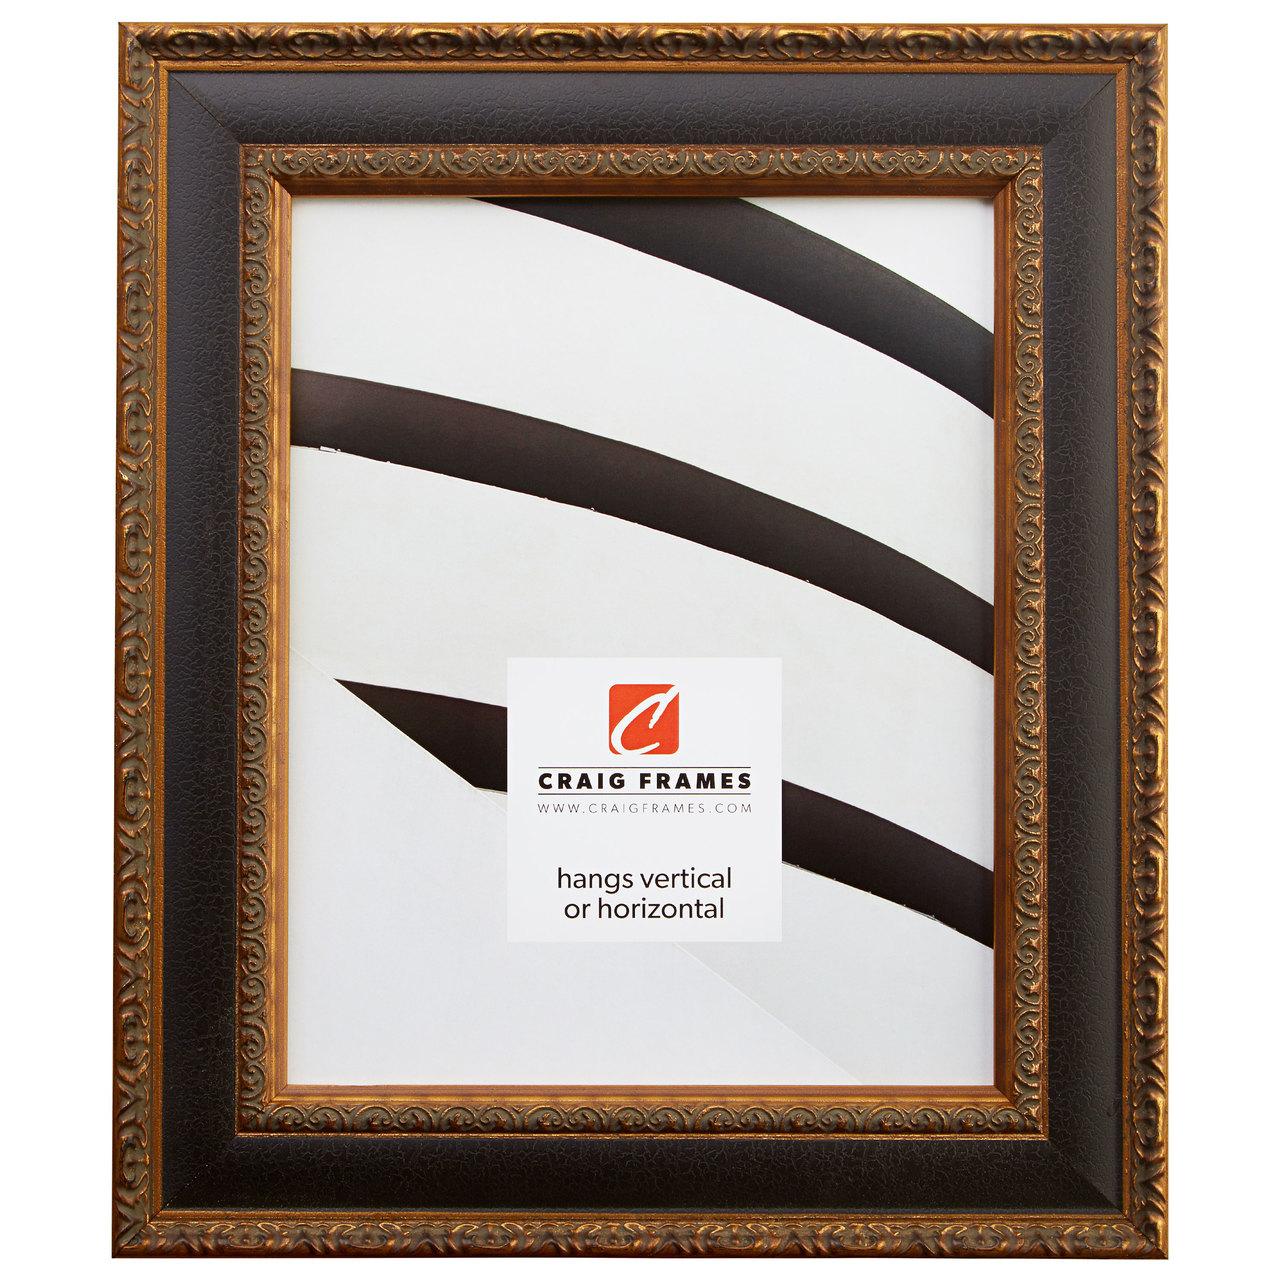 "Galerie 1.75"", Antique Black & Gold Picture Frame"